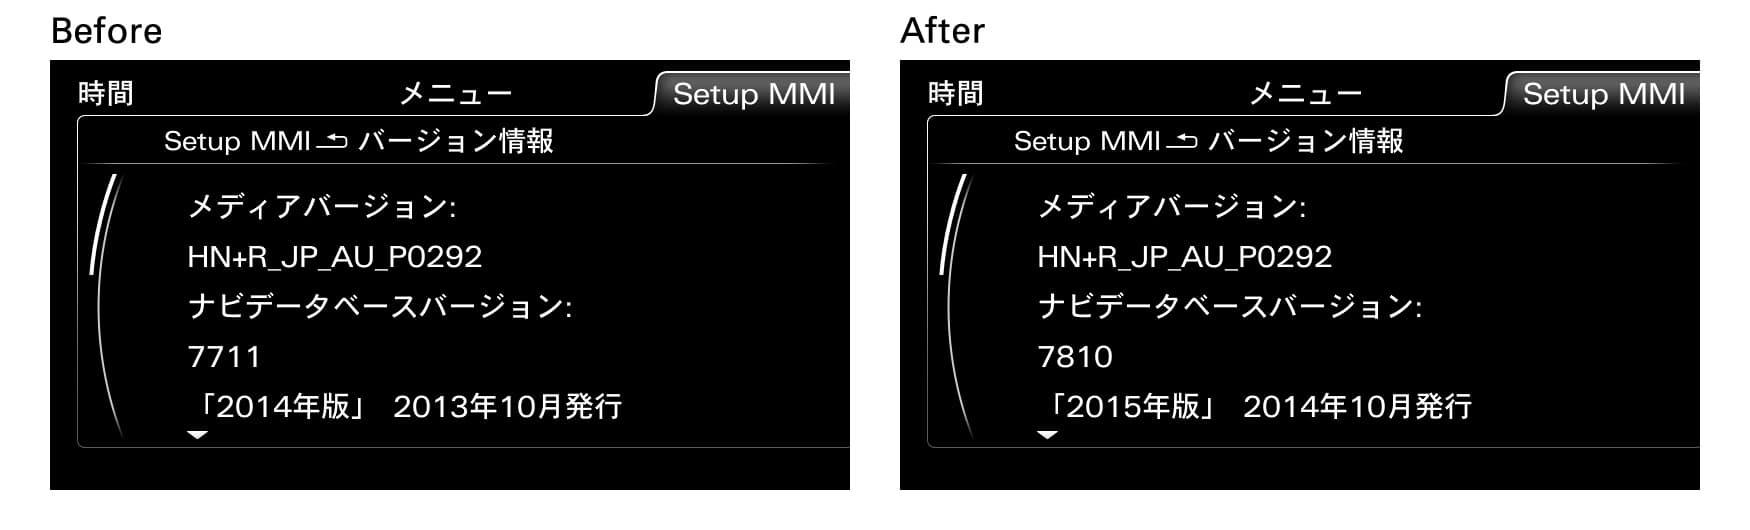 150424-MMI-11.jpg